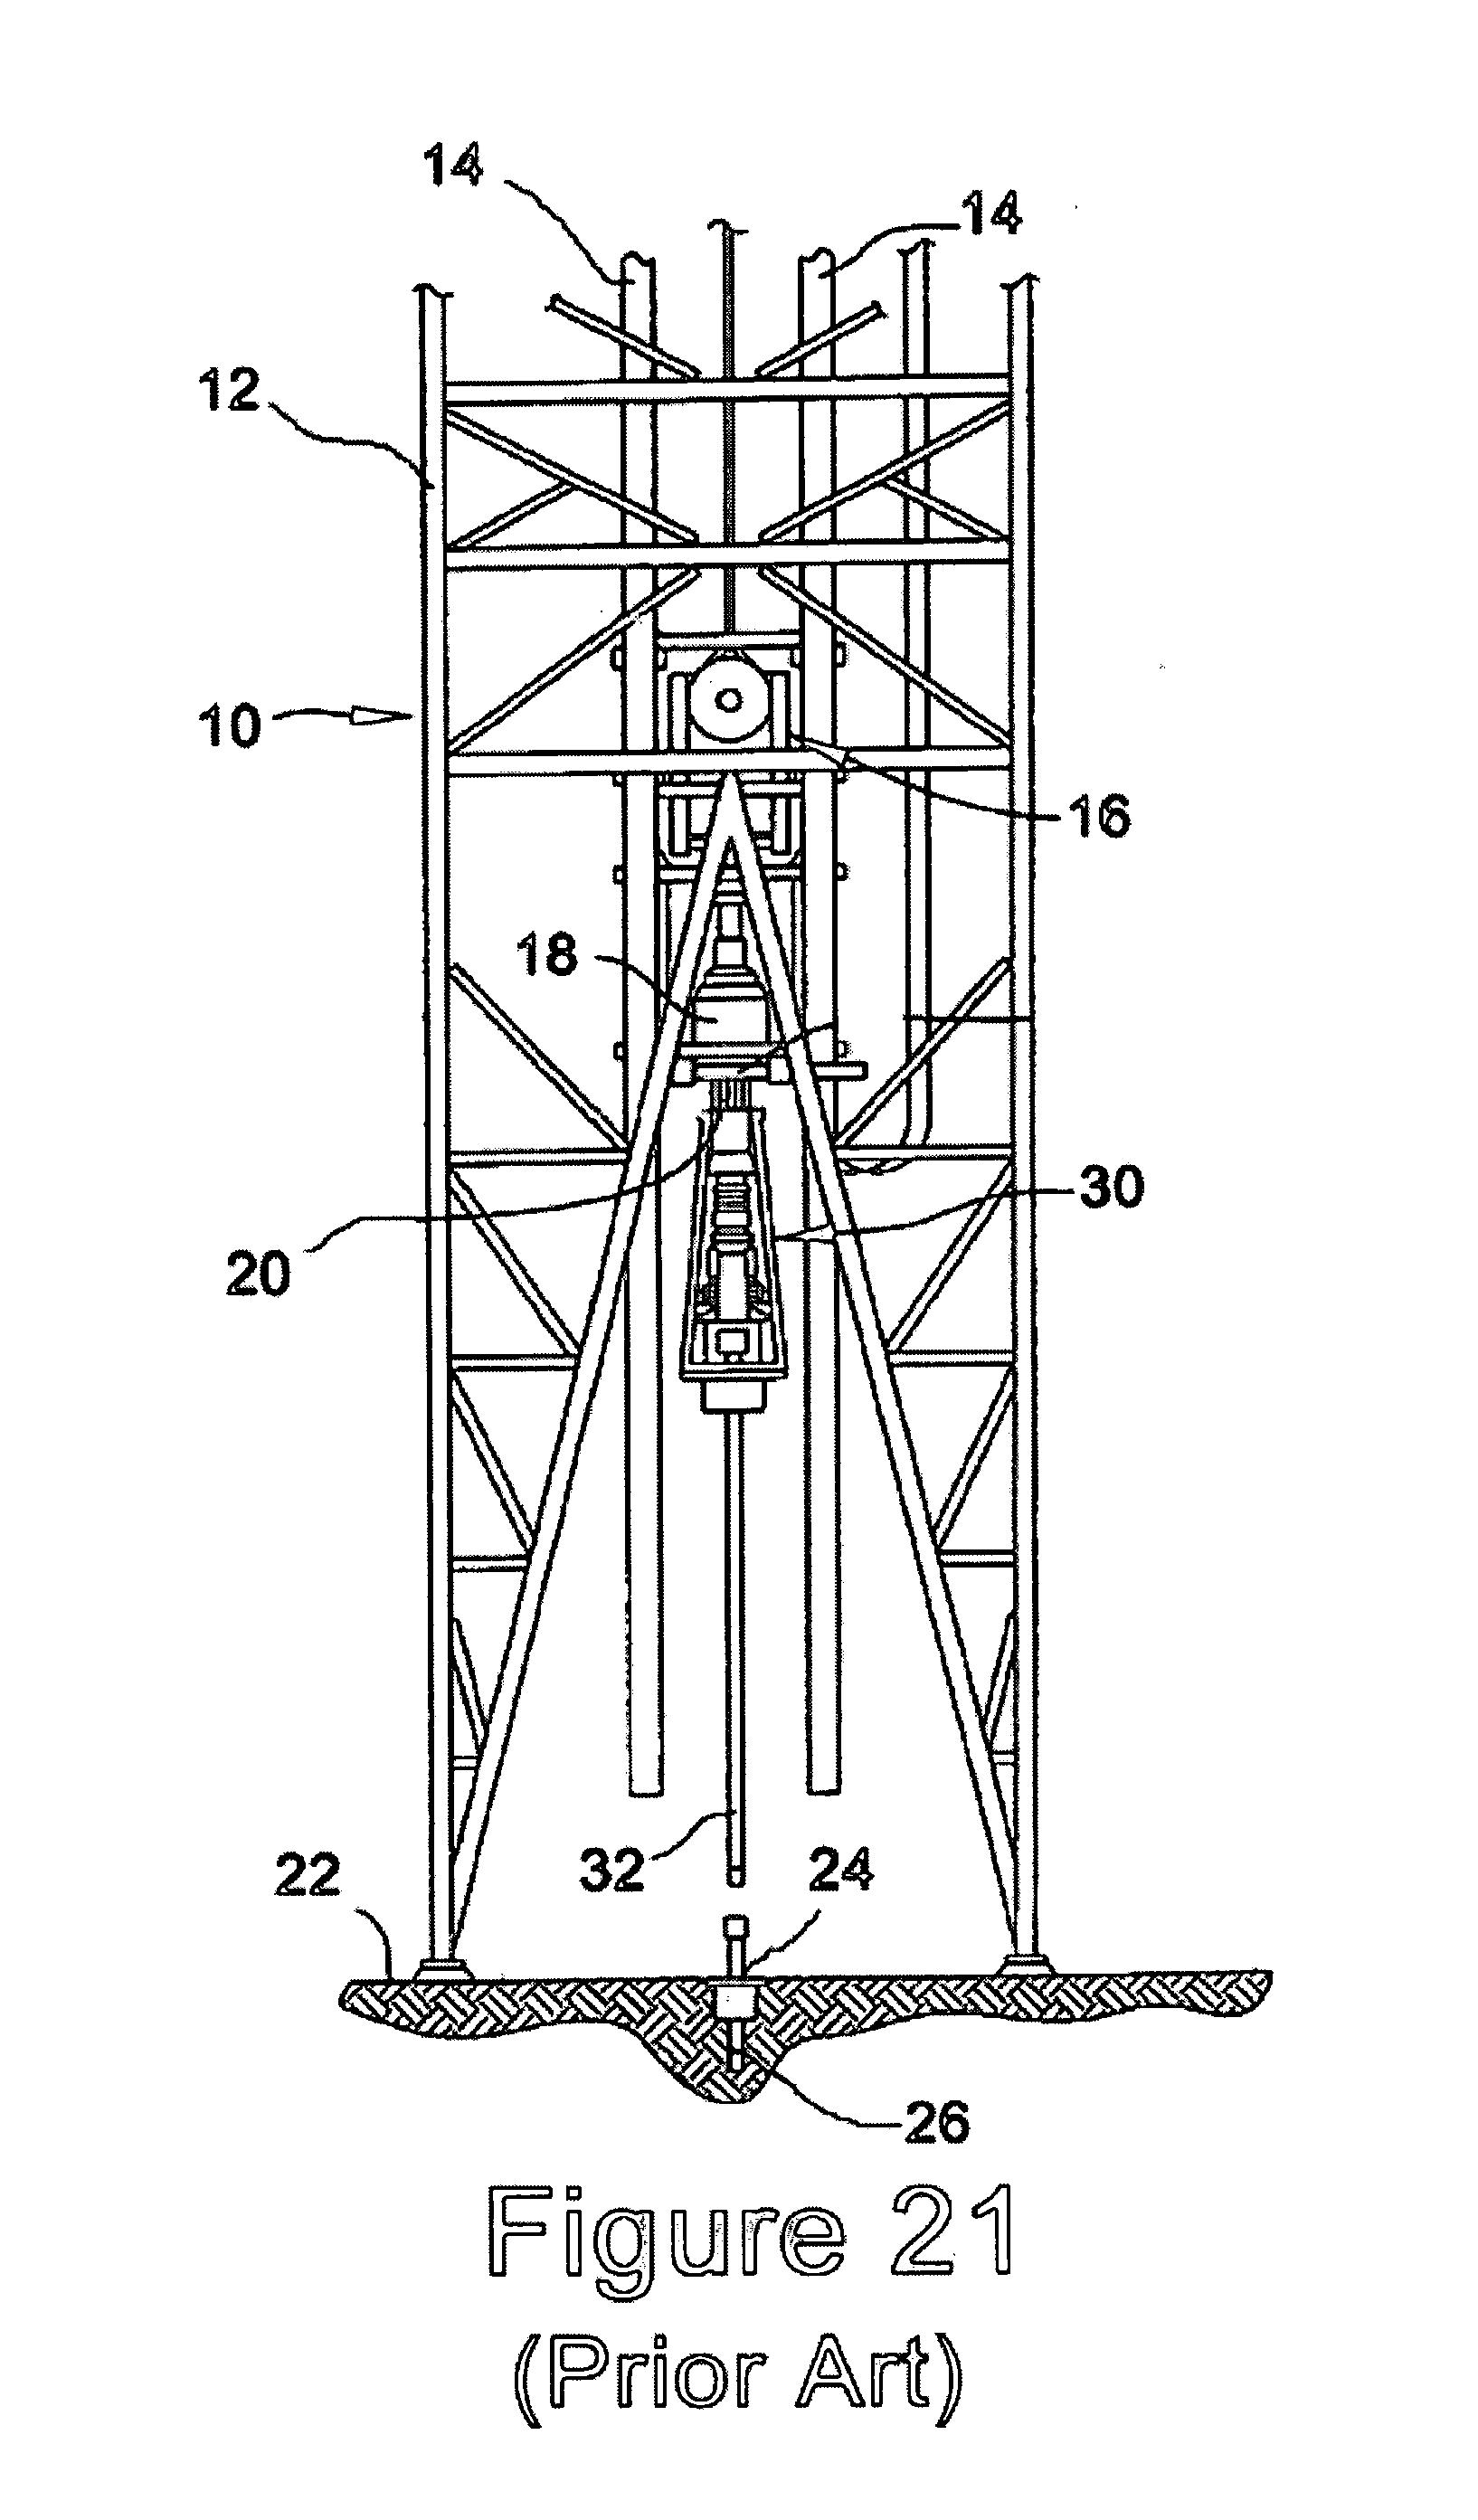 Rig Floor Elevation : Patent us  well tubular running tool google